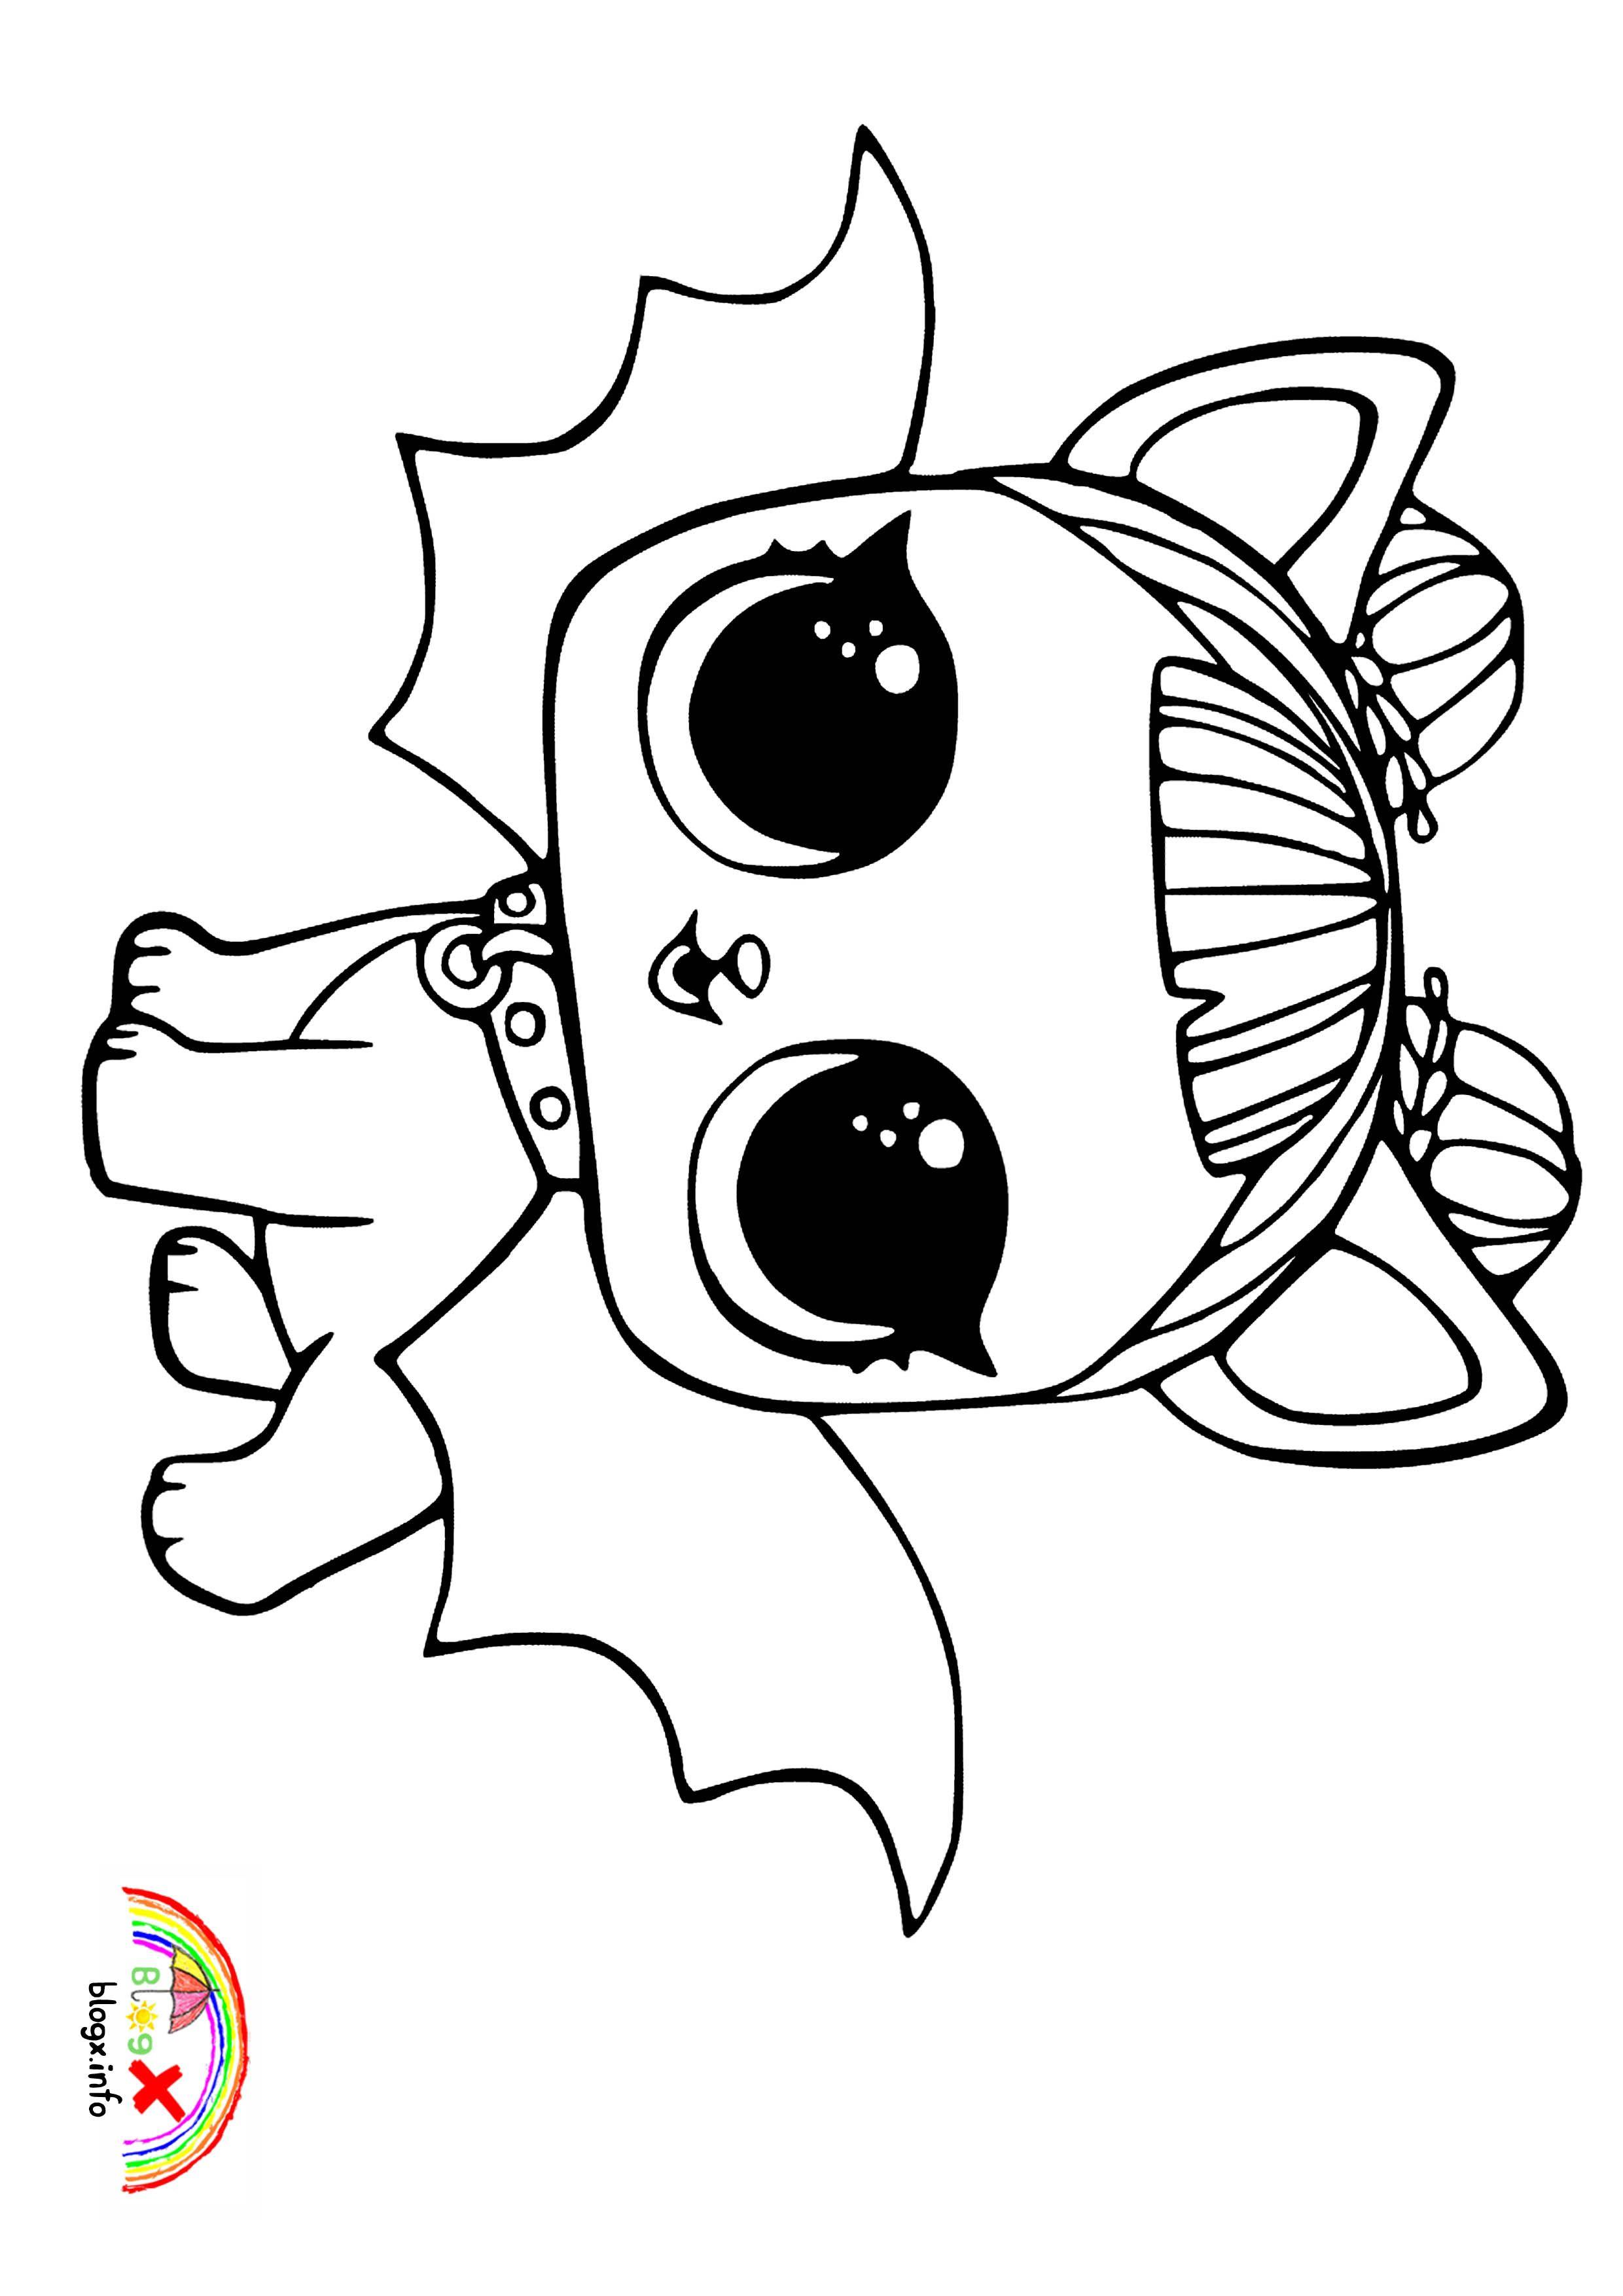 Cute Surprise Lol Coloring Page Unicorn Coloring Pages Coloring Pages Free Kids Coloring Pages